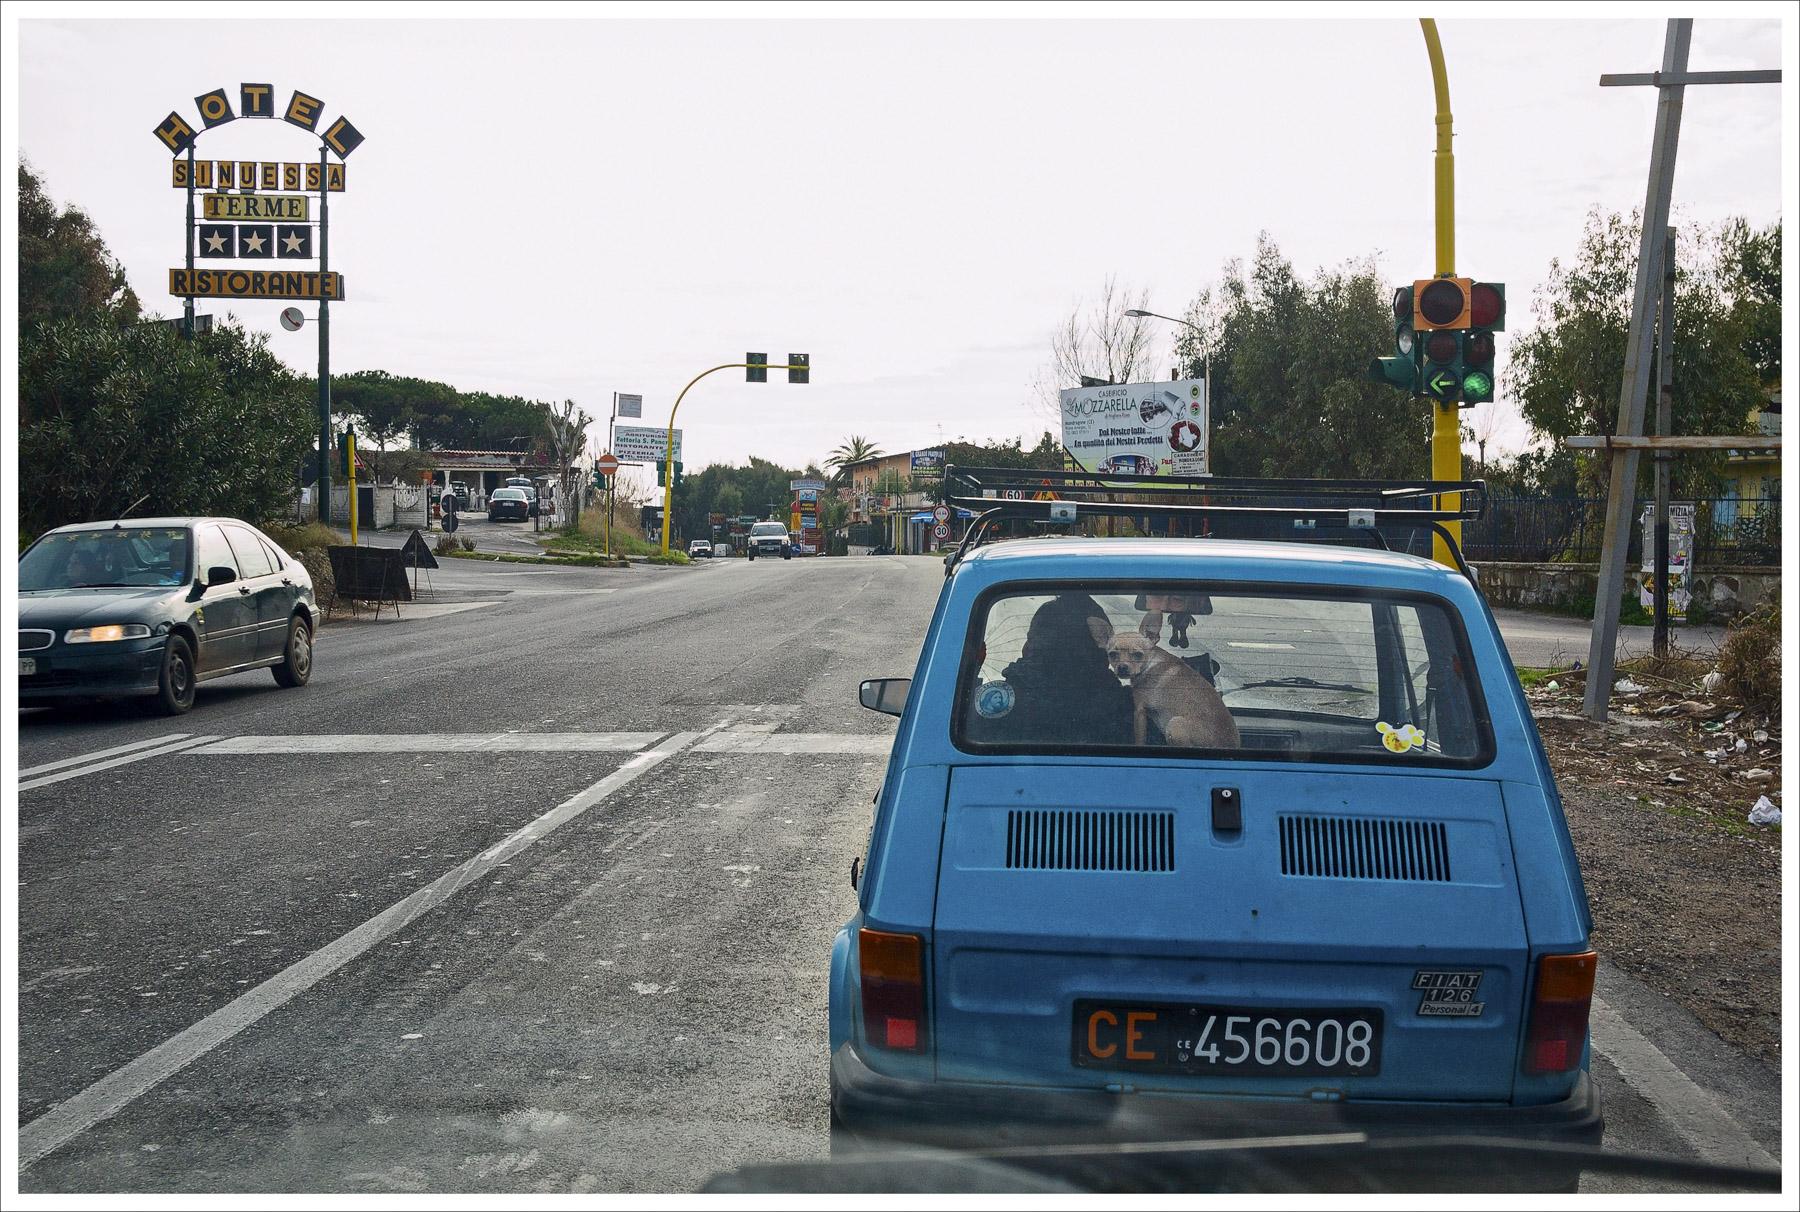 Saluti-da-PINETAMARE-03-1020933.jpg